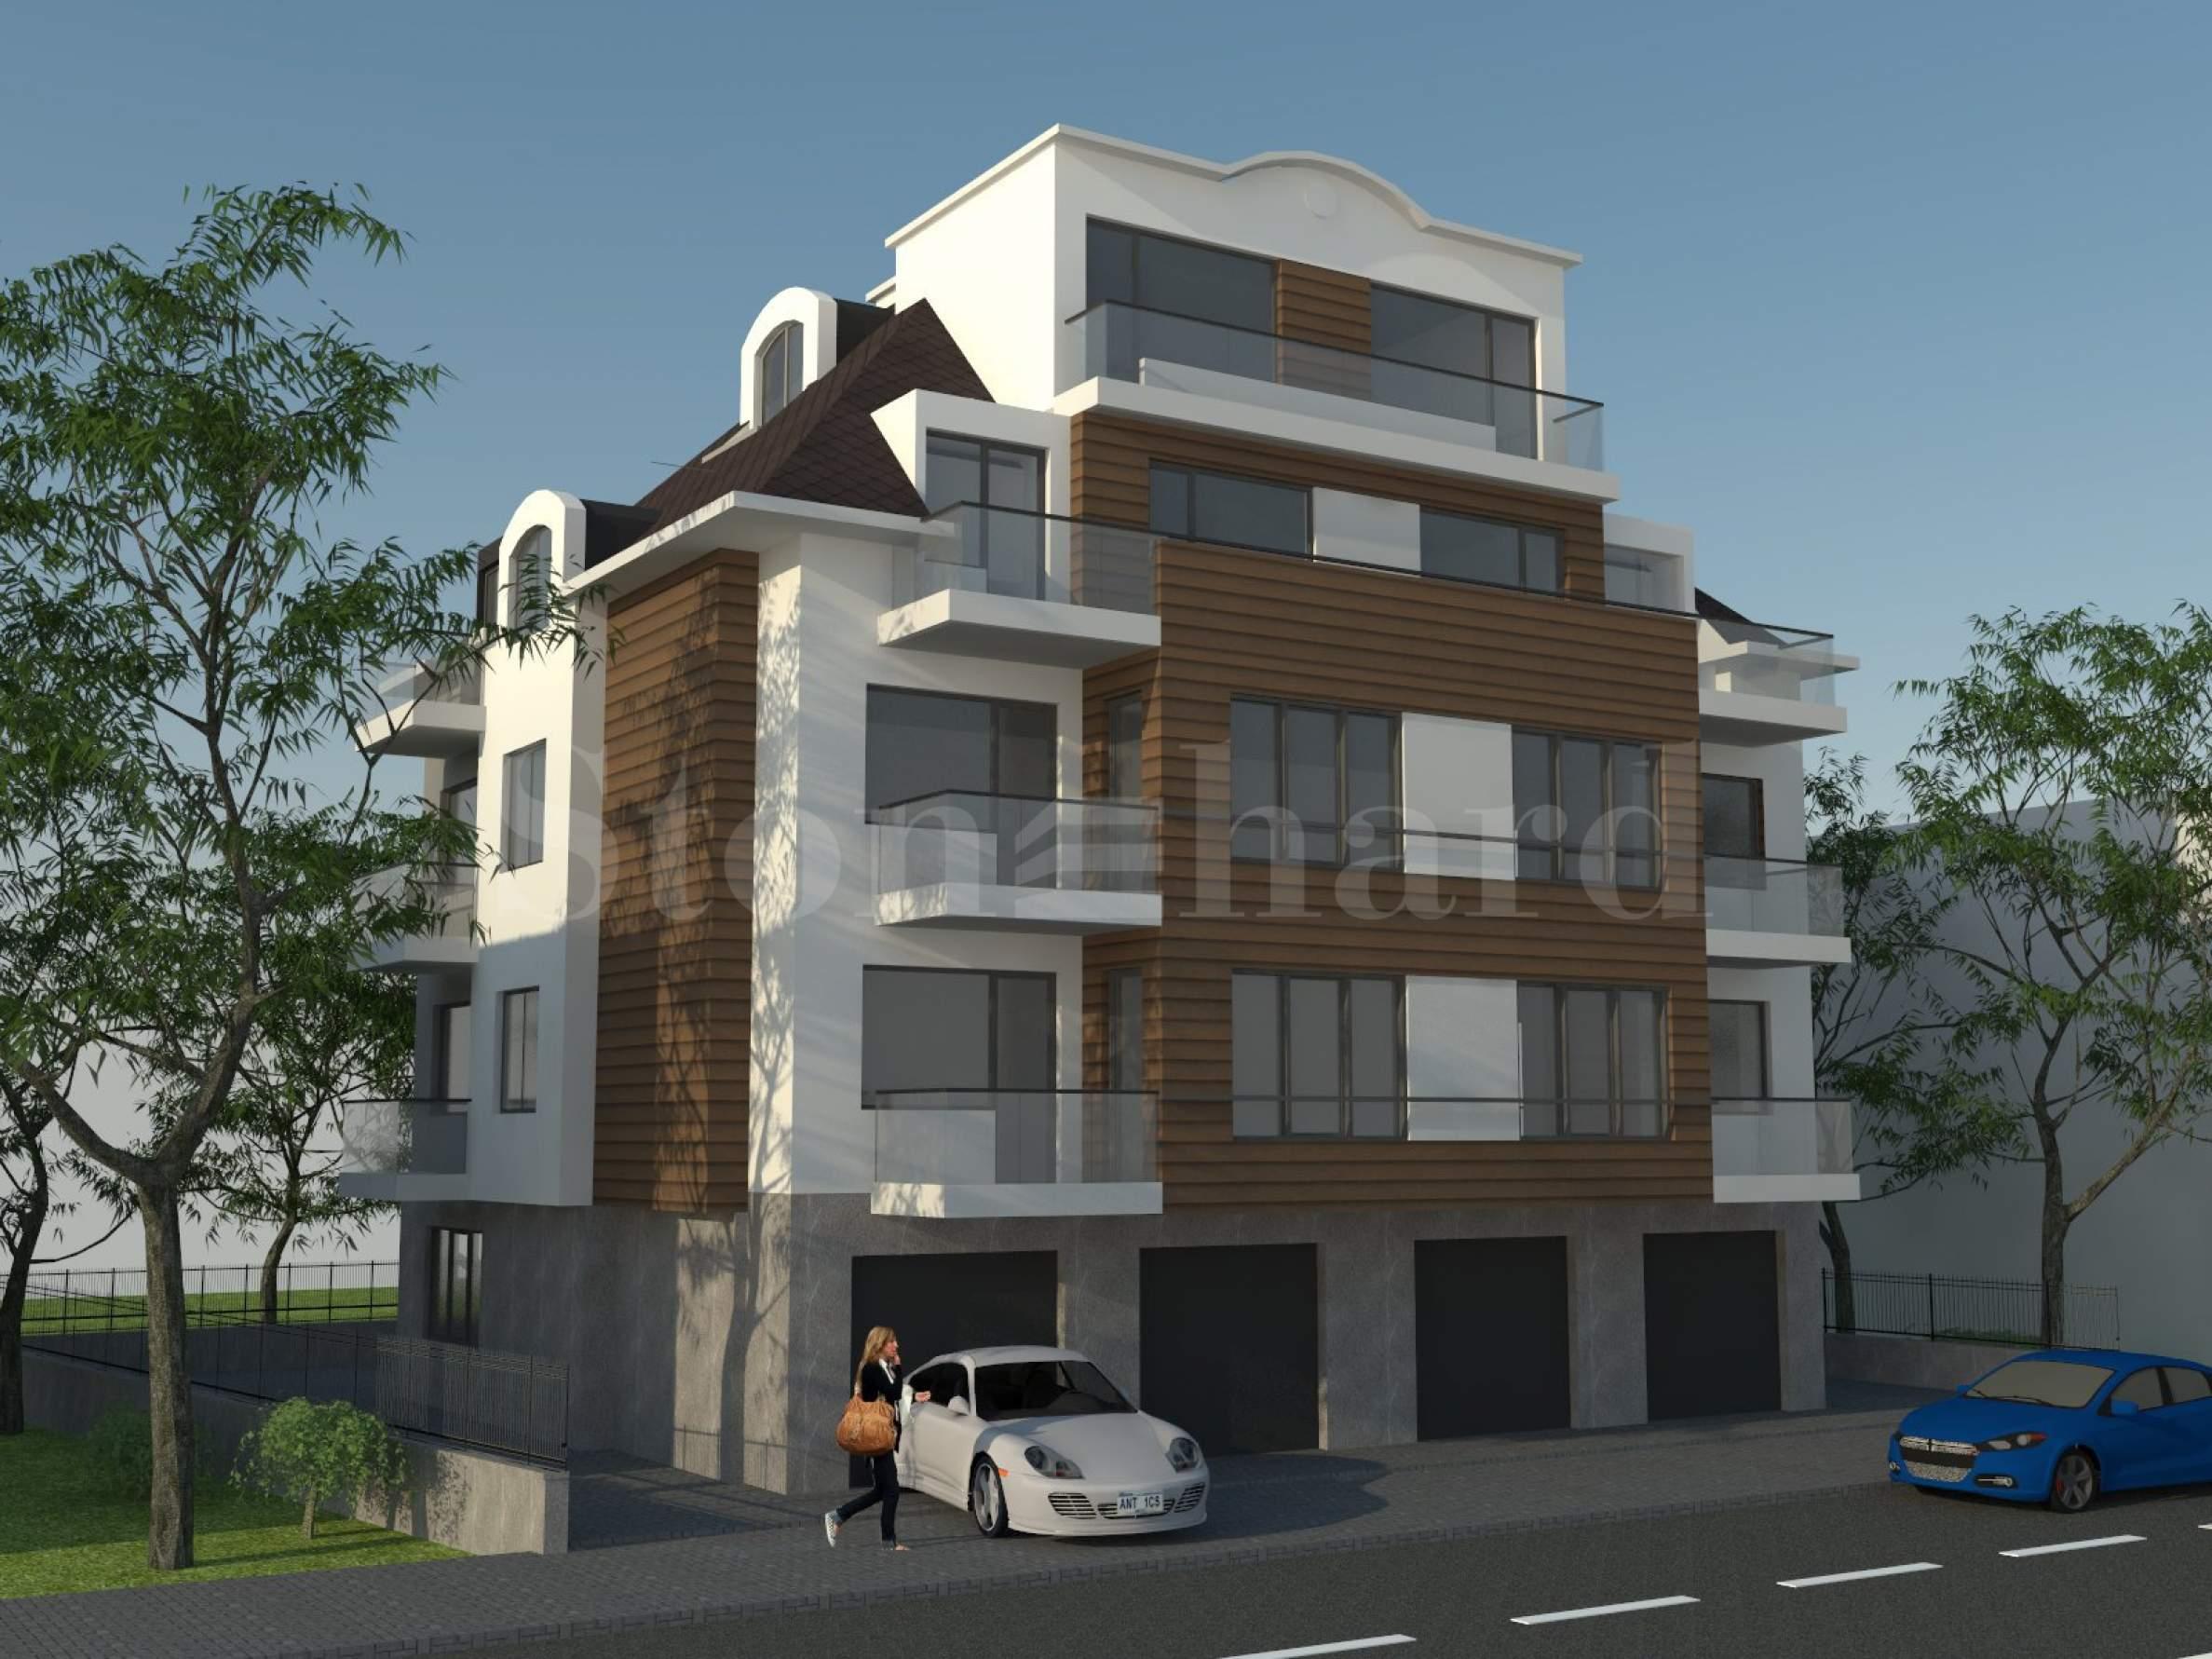 Stylish apartment building on Cherni Vrah Blvd, Krastova Vada District1 - Stonehard